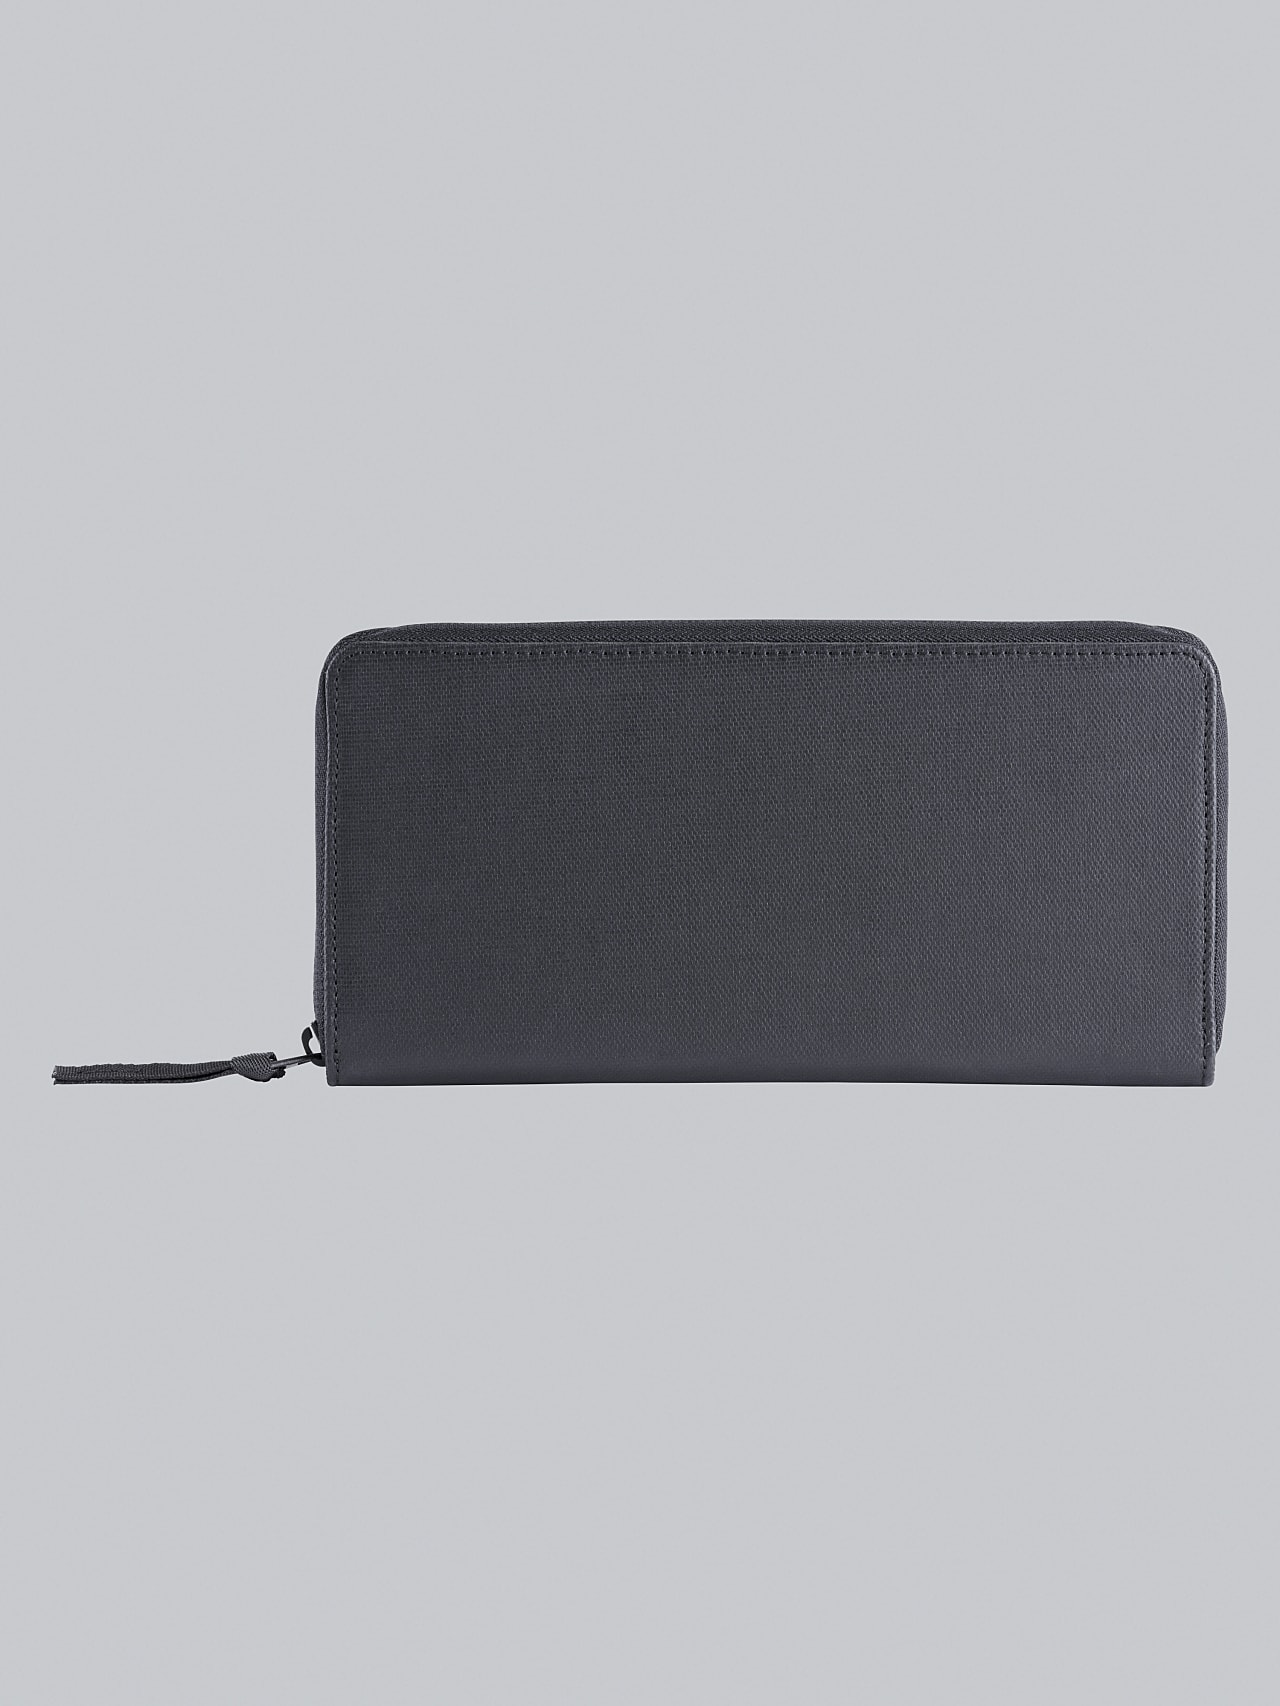 APOM V1.Y5.02 Water-Repellent Zip Wallet dark grey / anthracite Left Alpha Tauri